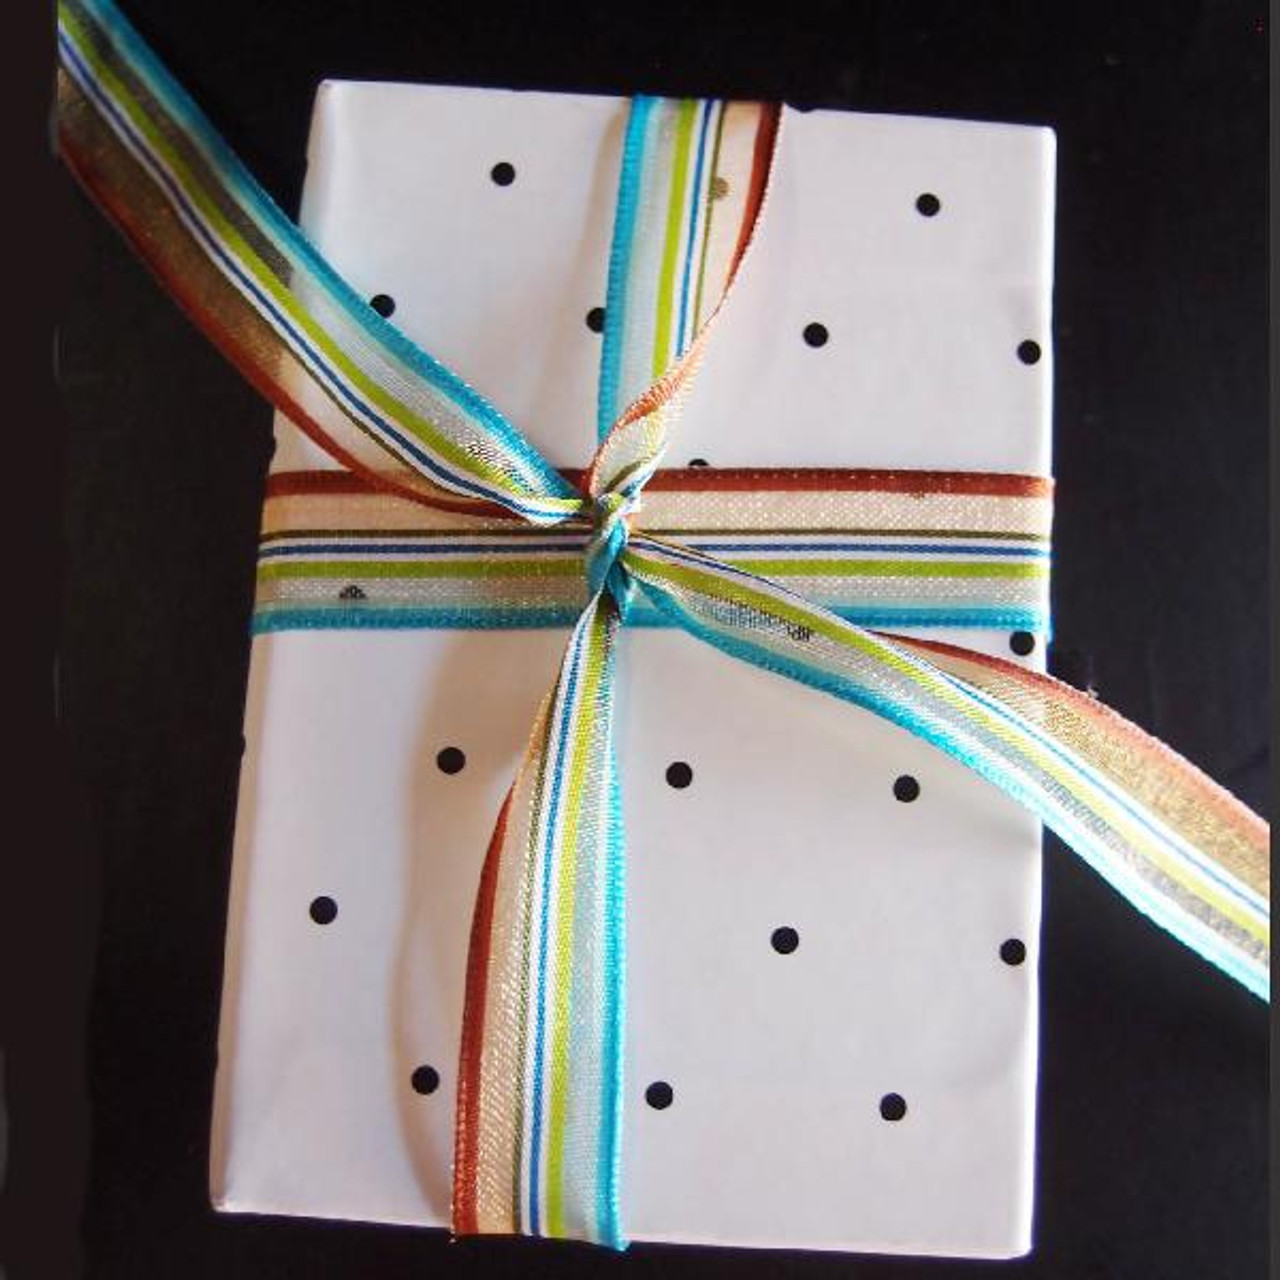 Brown-Green-White-Blue Multi-Stripes Sheer Ribbon